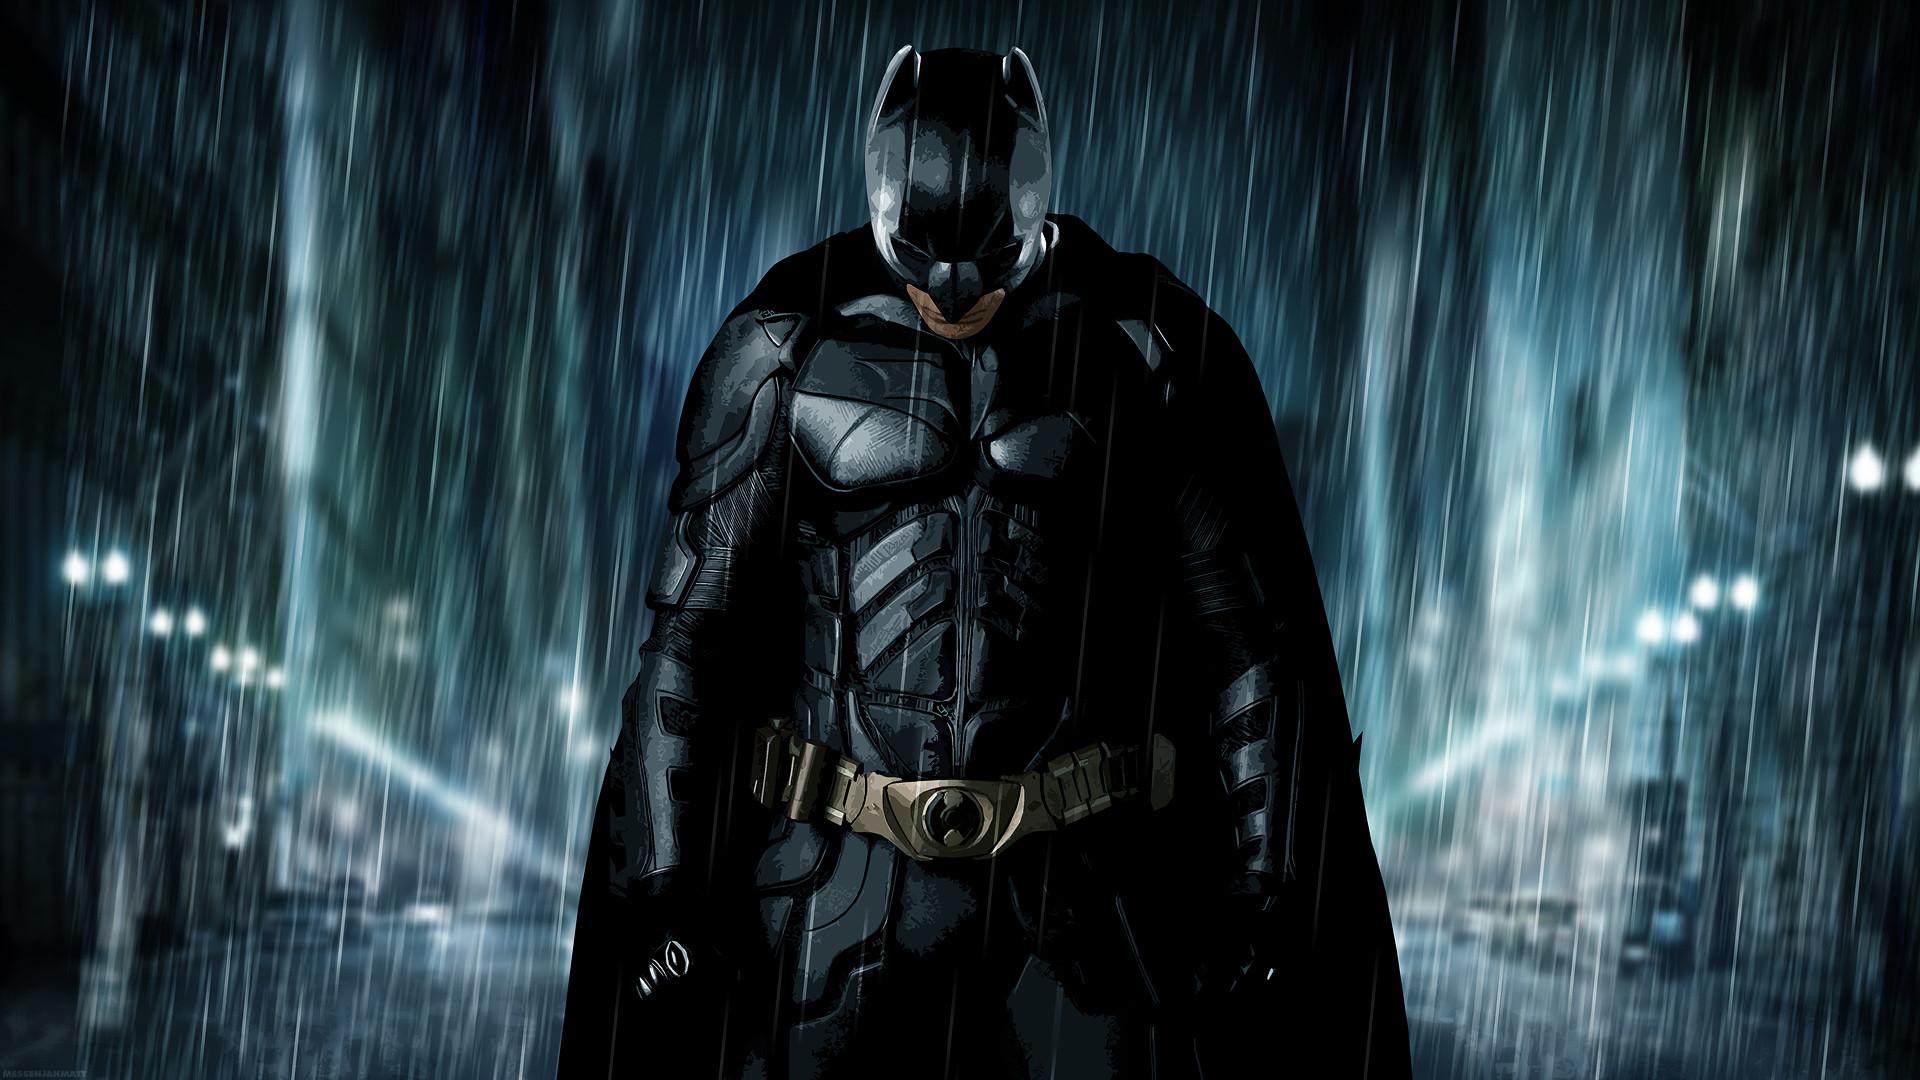 Batman The Dark Knight Rises – https://www.0wallpapers.com/